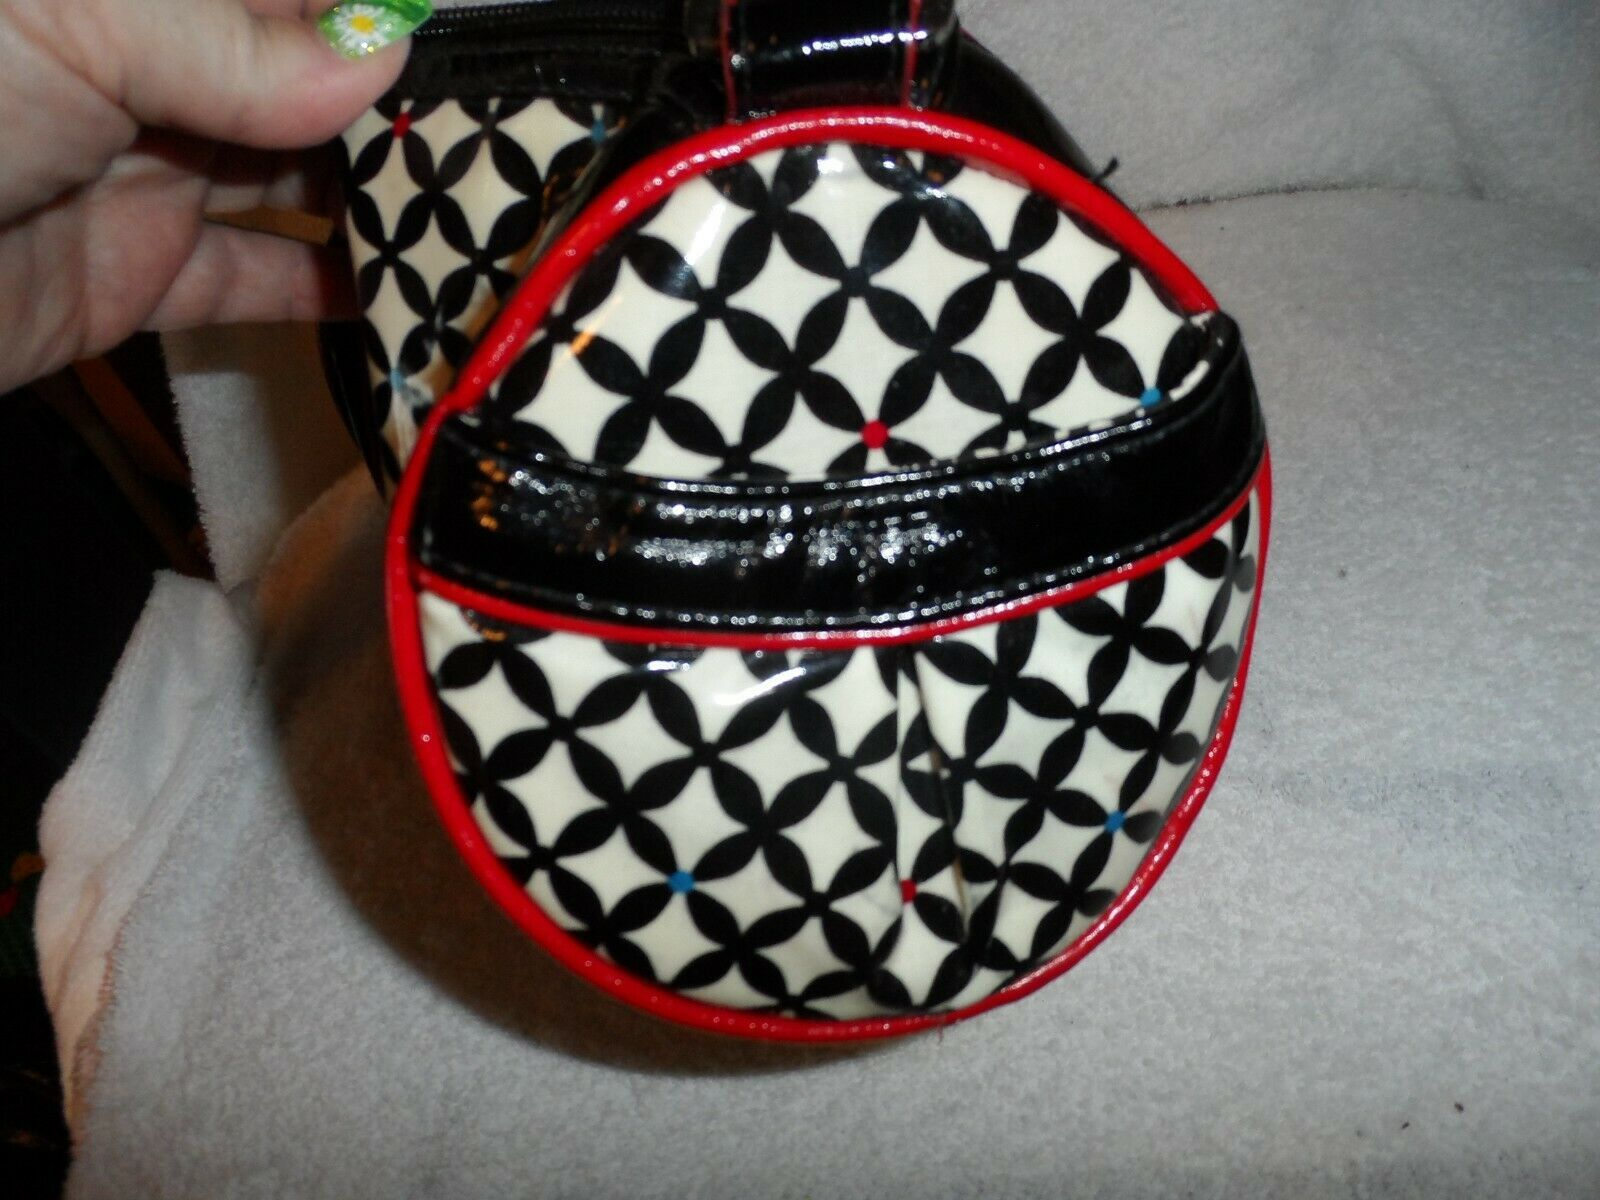 Vera bradley frill duffel style handbag in Barcelona